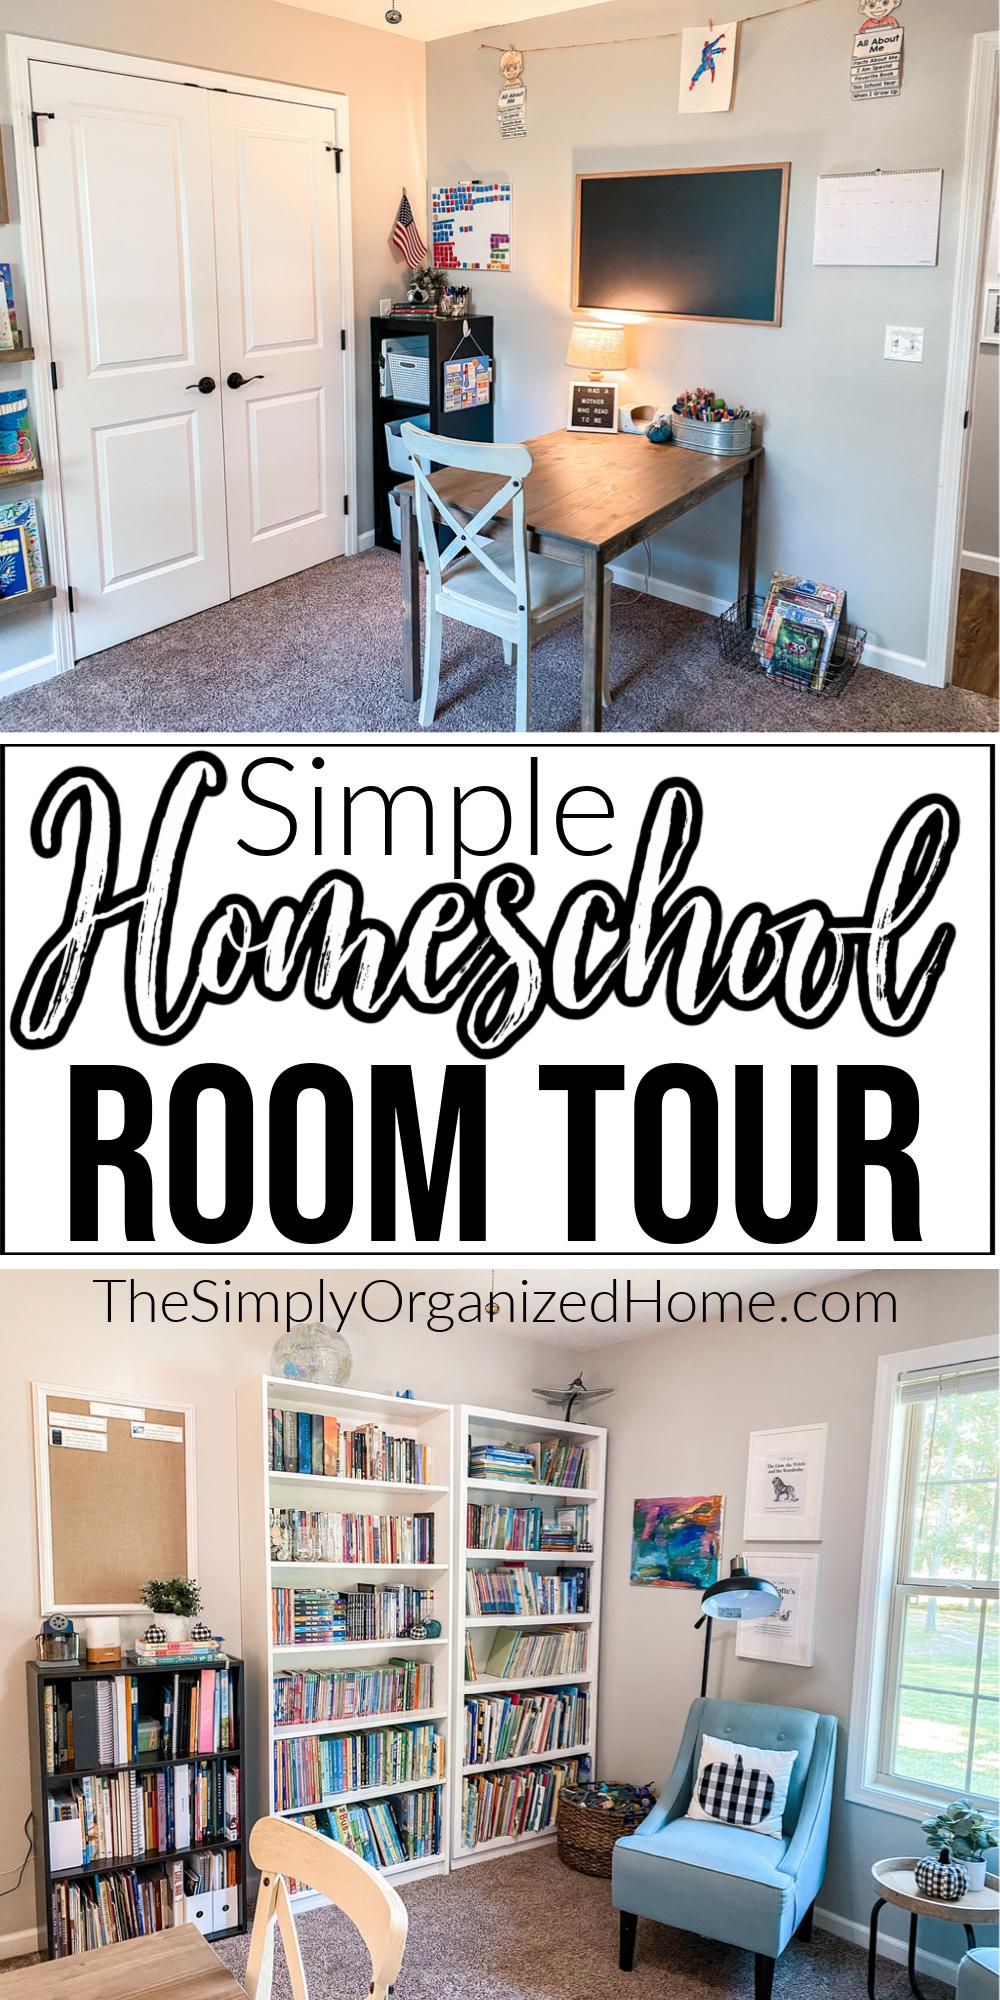 Homeschool Room Tour